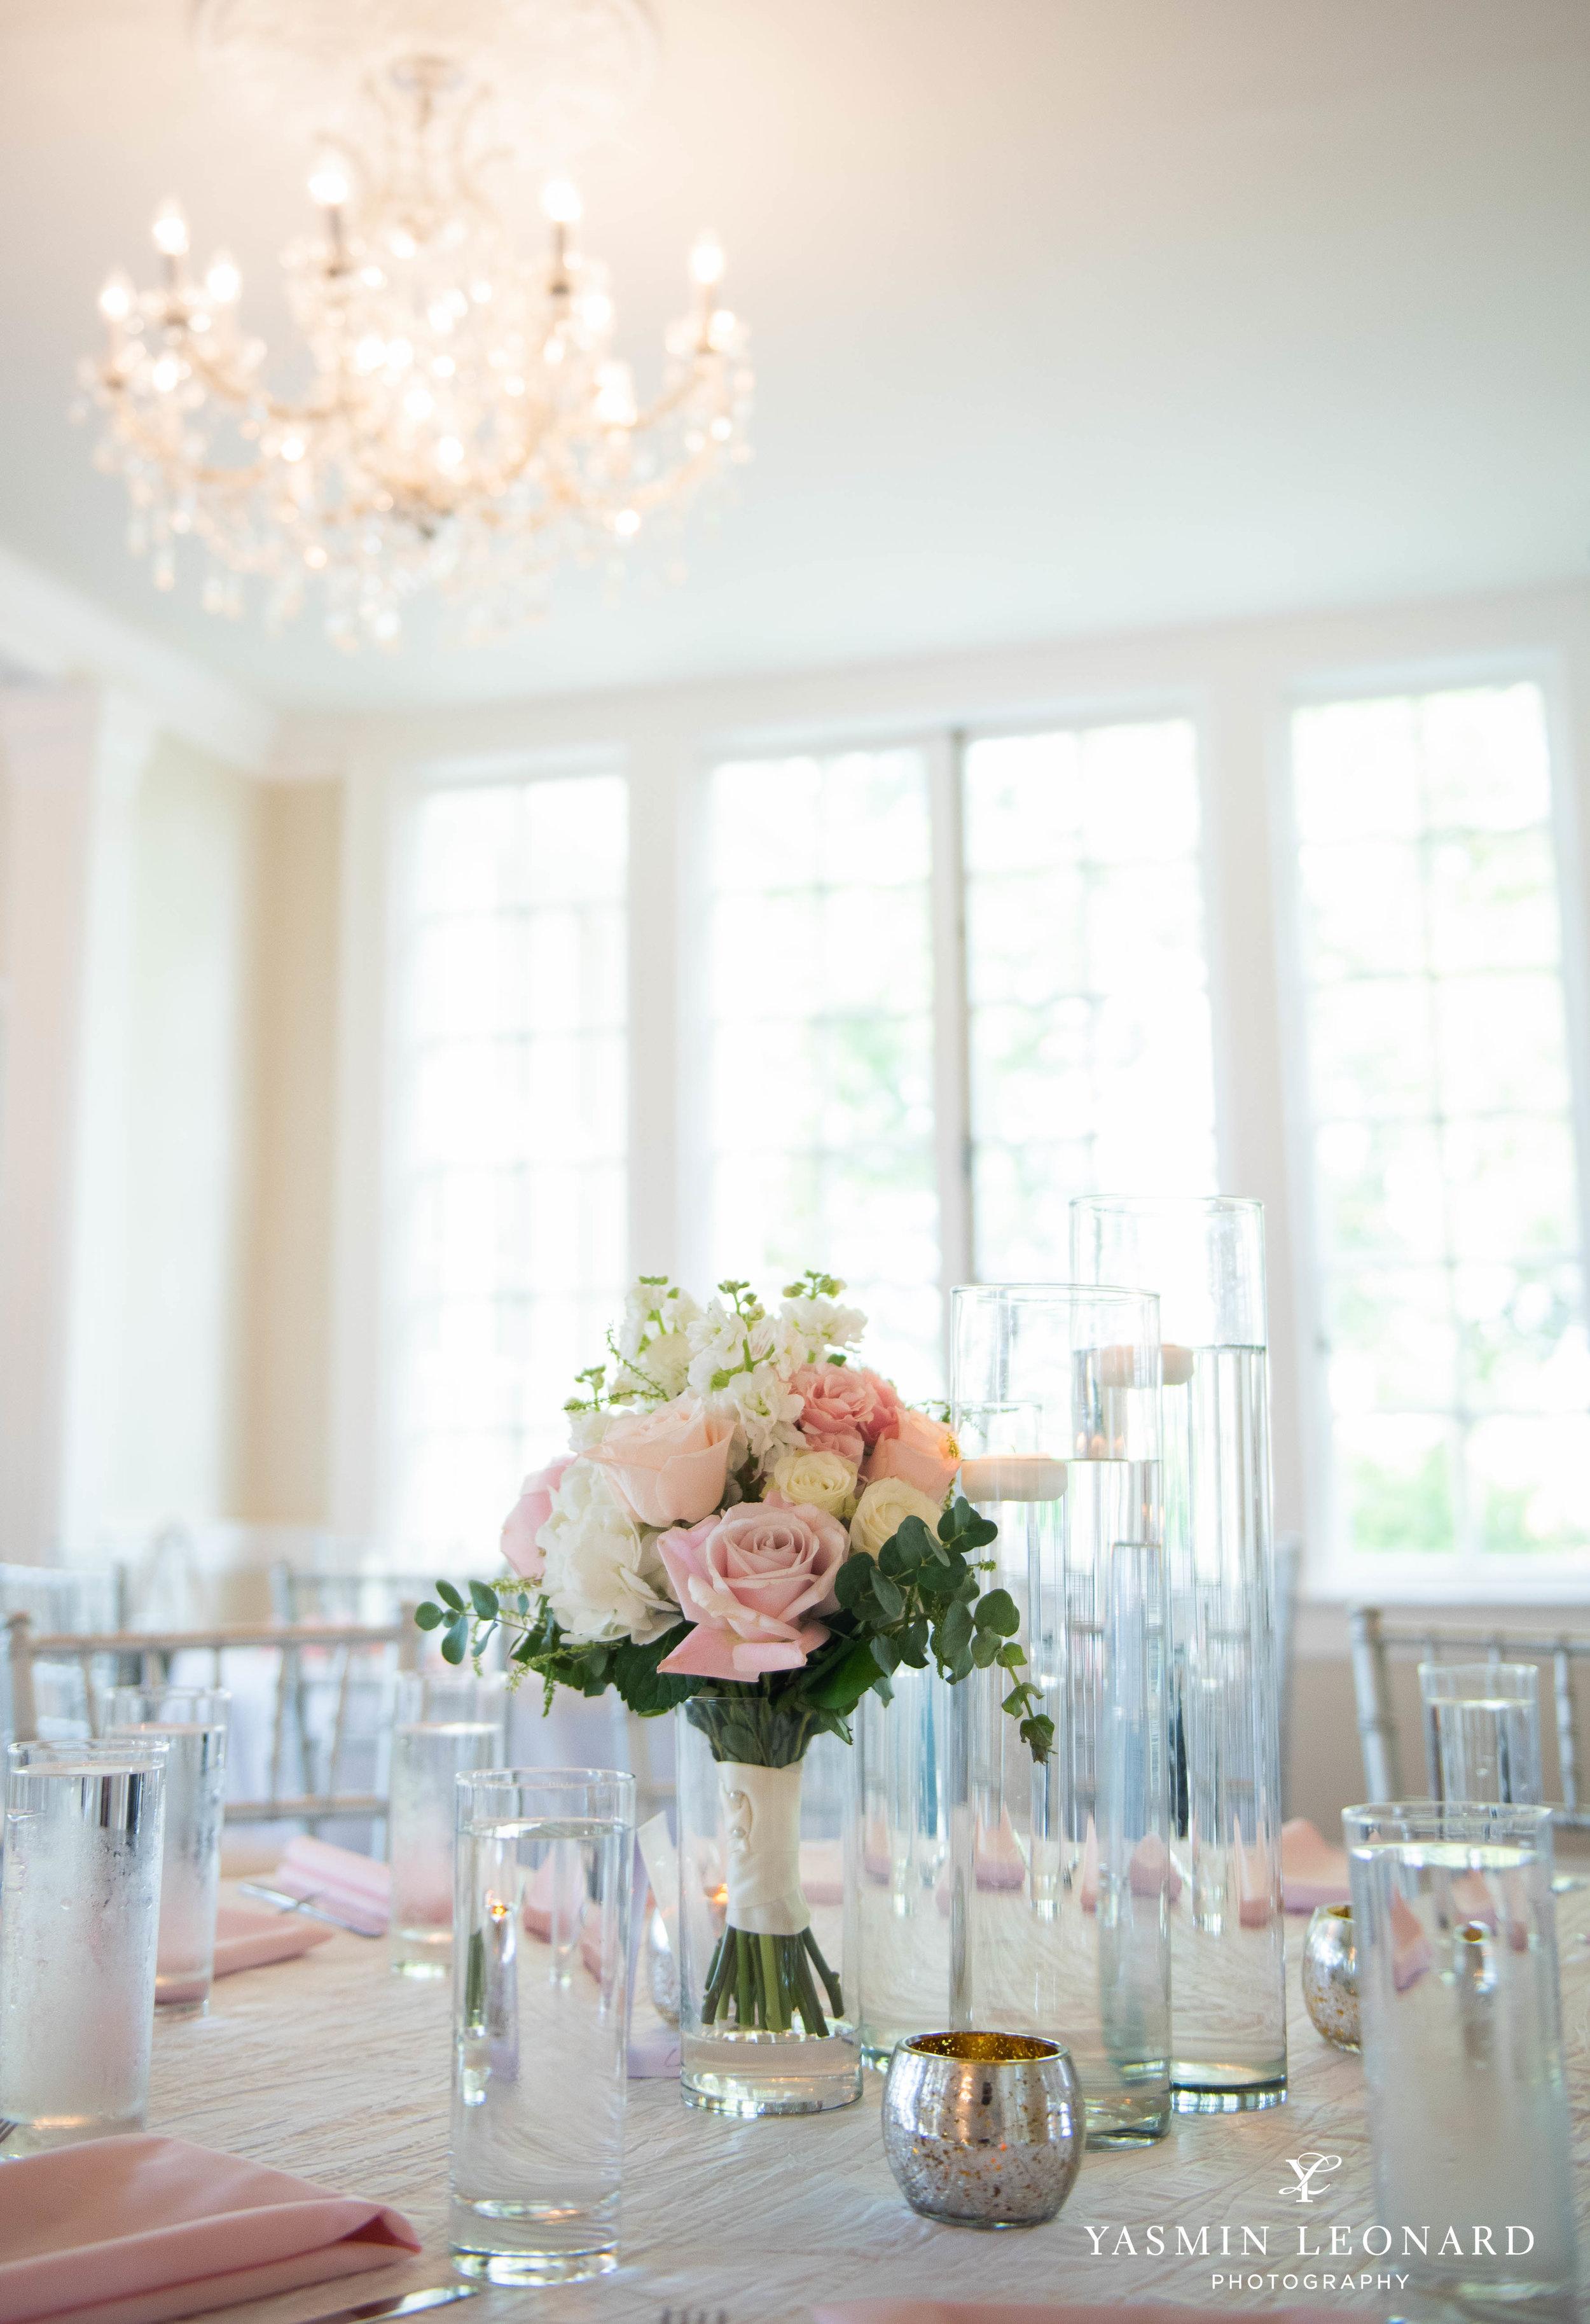 Separk Mansion - NC Weddings - Gastonia Wedding - NC Wedding Venues - Pink and Blue Wedding Ideas - Pink Bridesmaid Dresses - Yasmin Leonard Photography-42.jpg